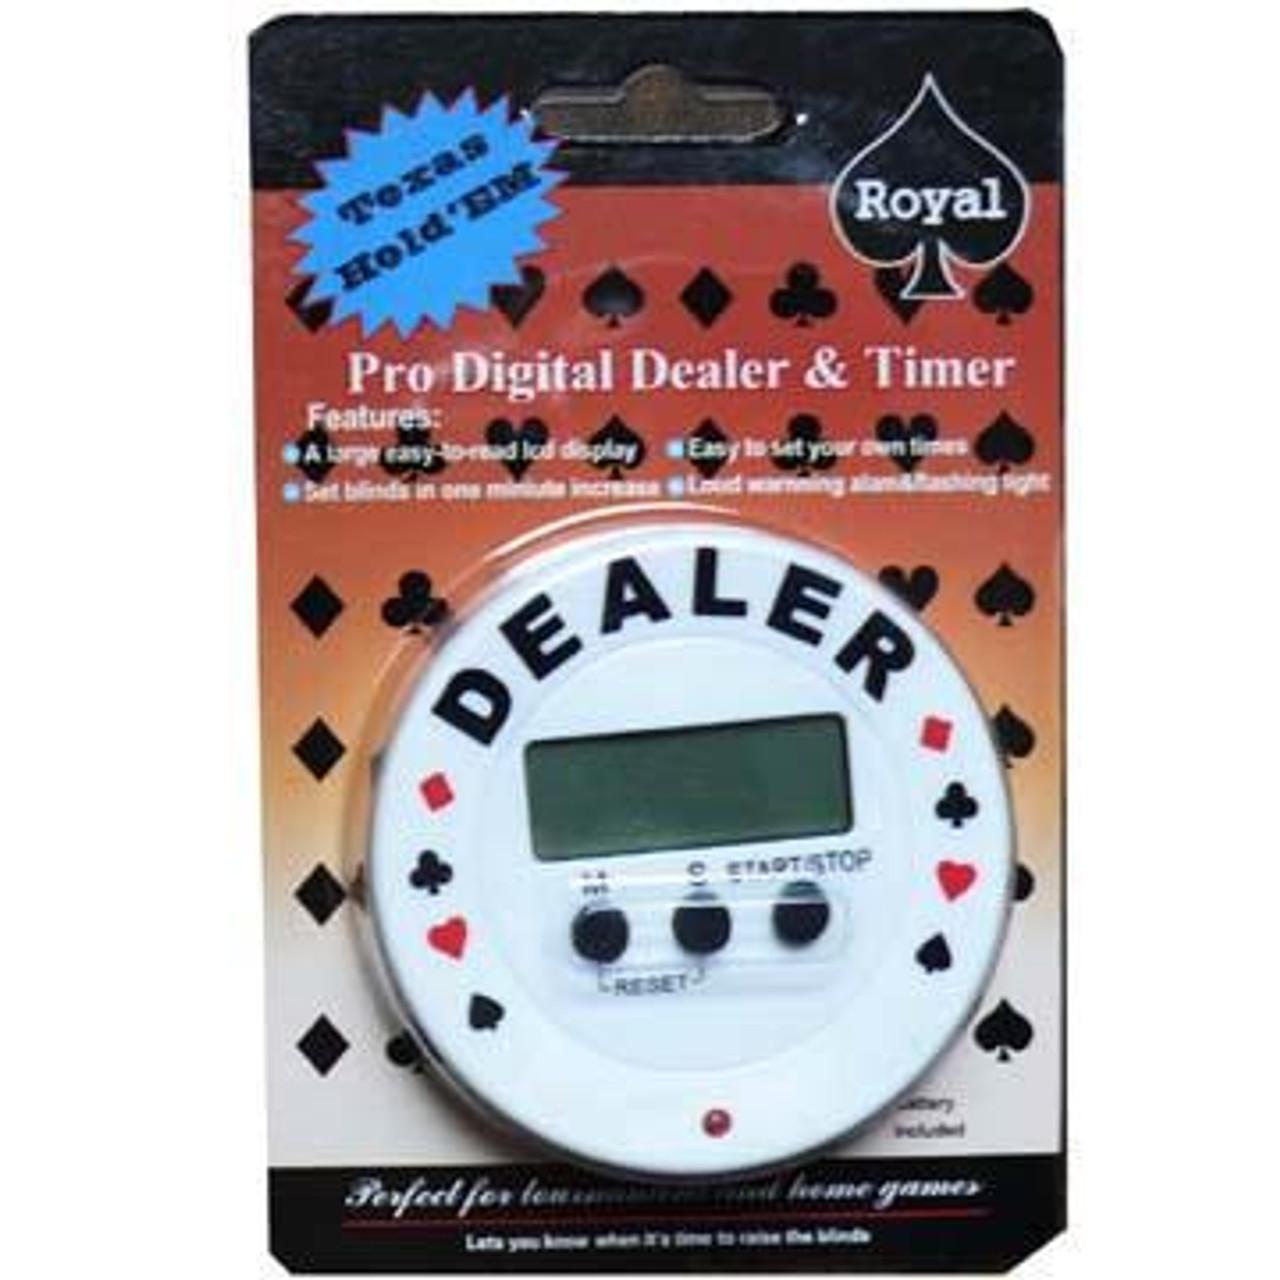 Buton de dealer electronic profesionist forma rotunda